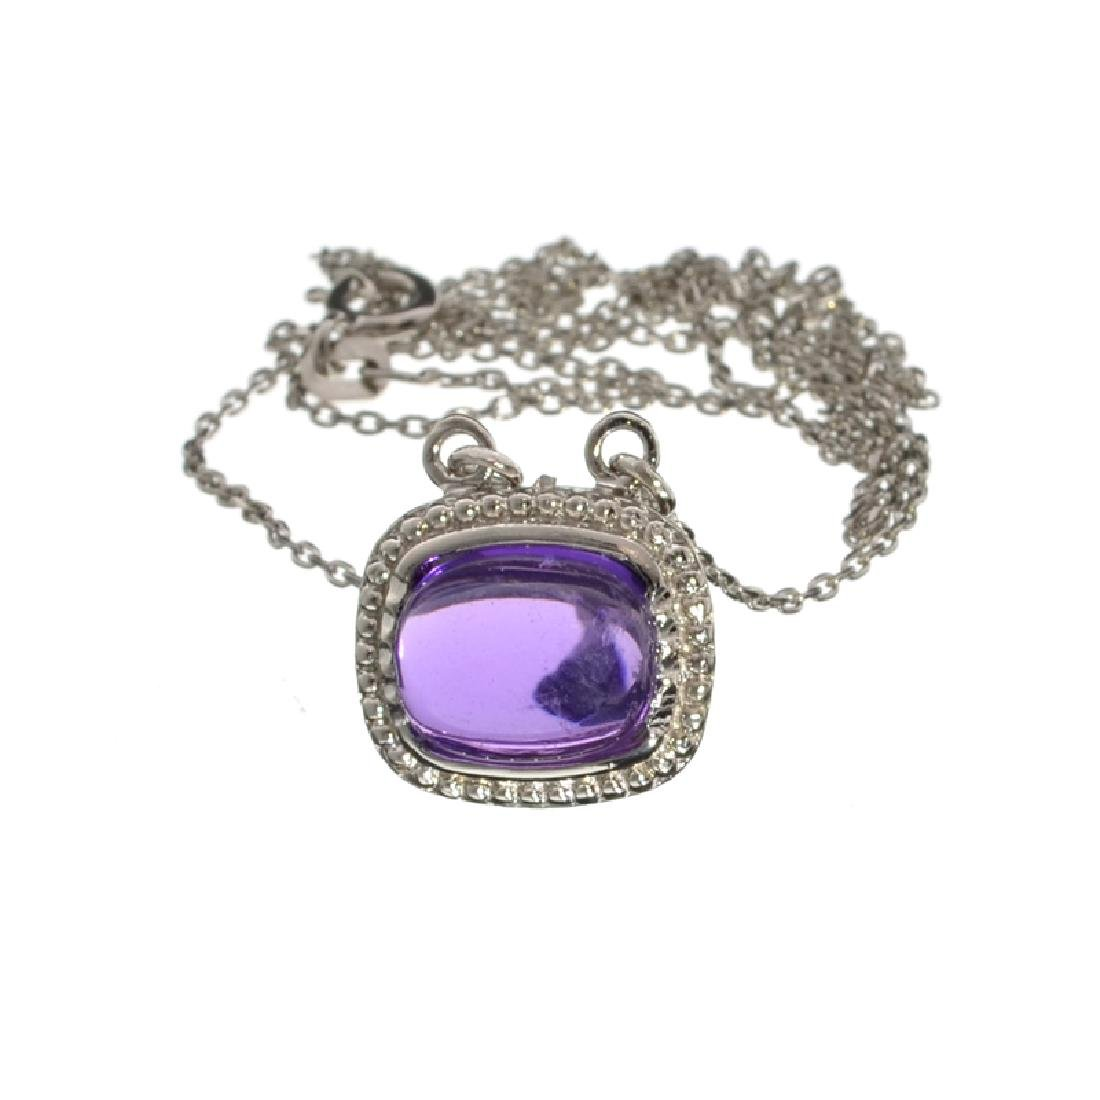 APP: 0.6k Fine Jewelry 3.91CT Cabochon Purple Amethyst